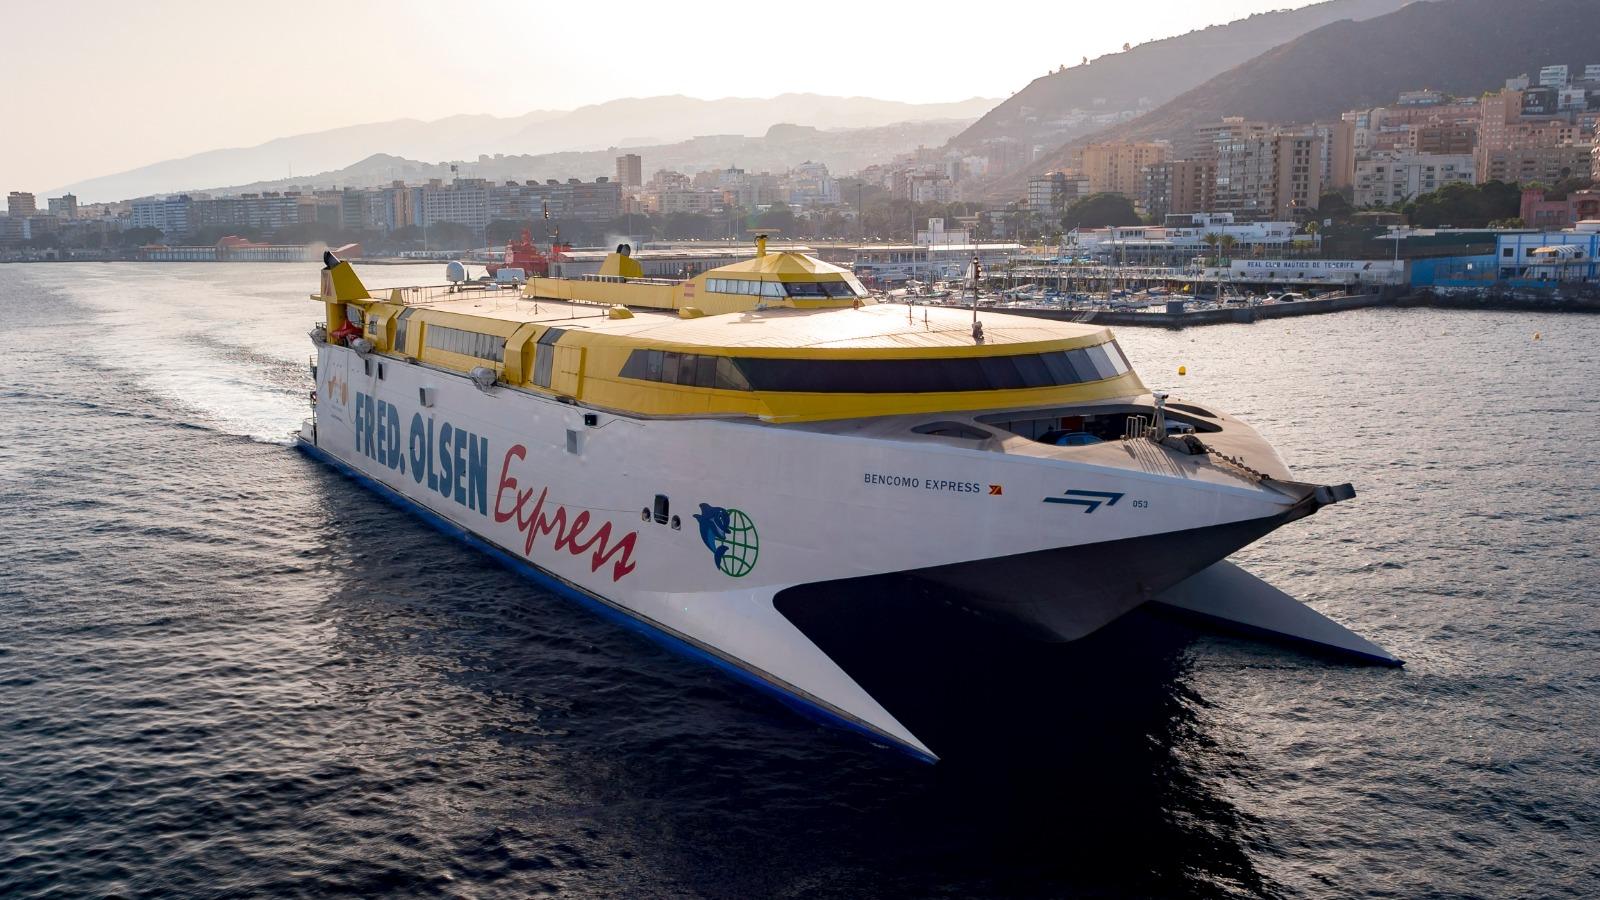 Bencomo Express saliendo de Santa Cruz de Tenerife